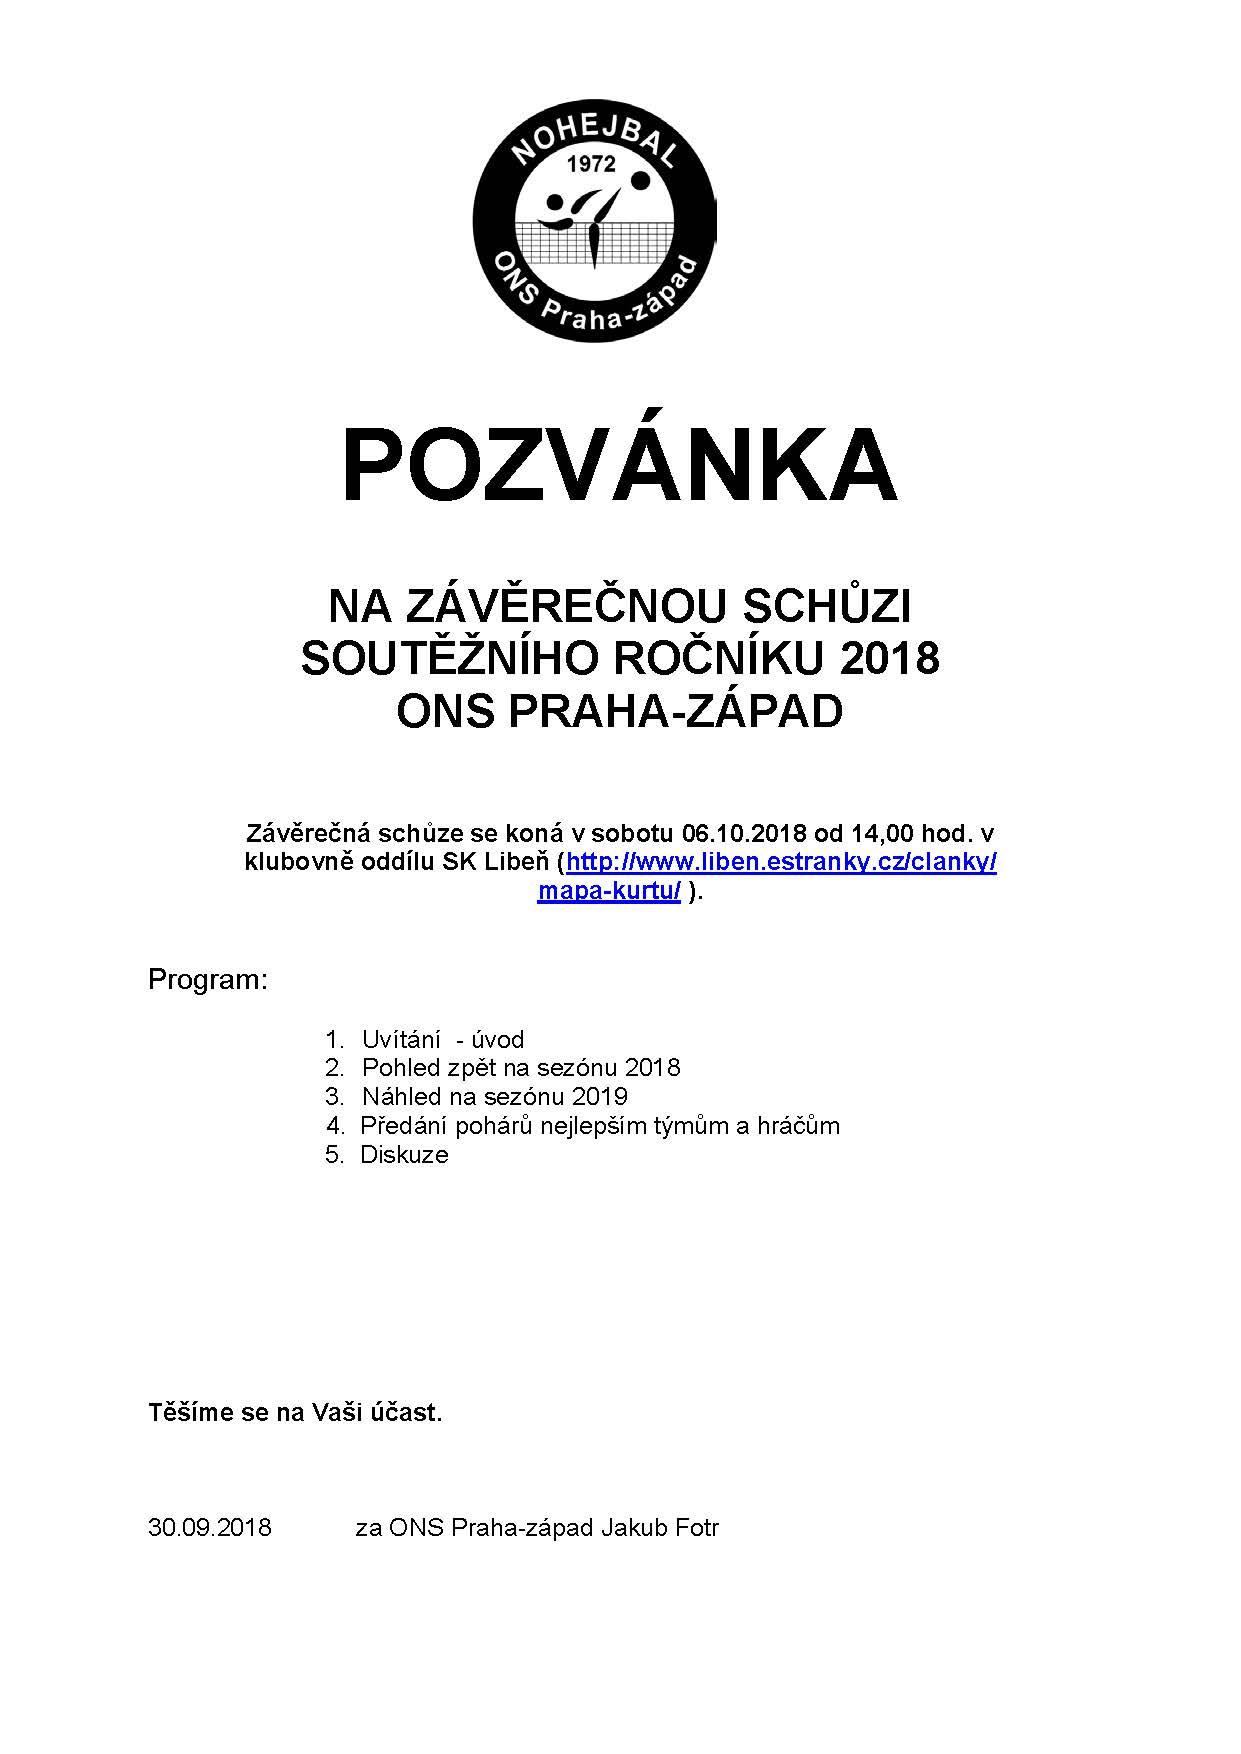 pozvanka-zakonceni-2018.jpg